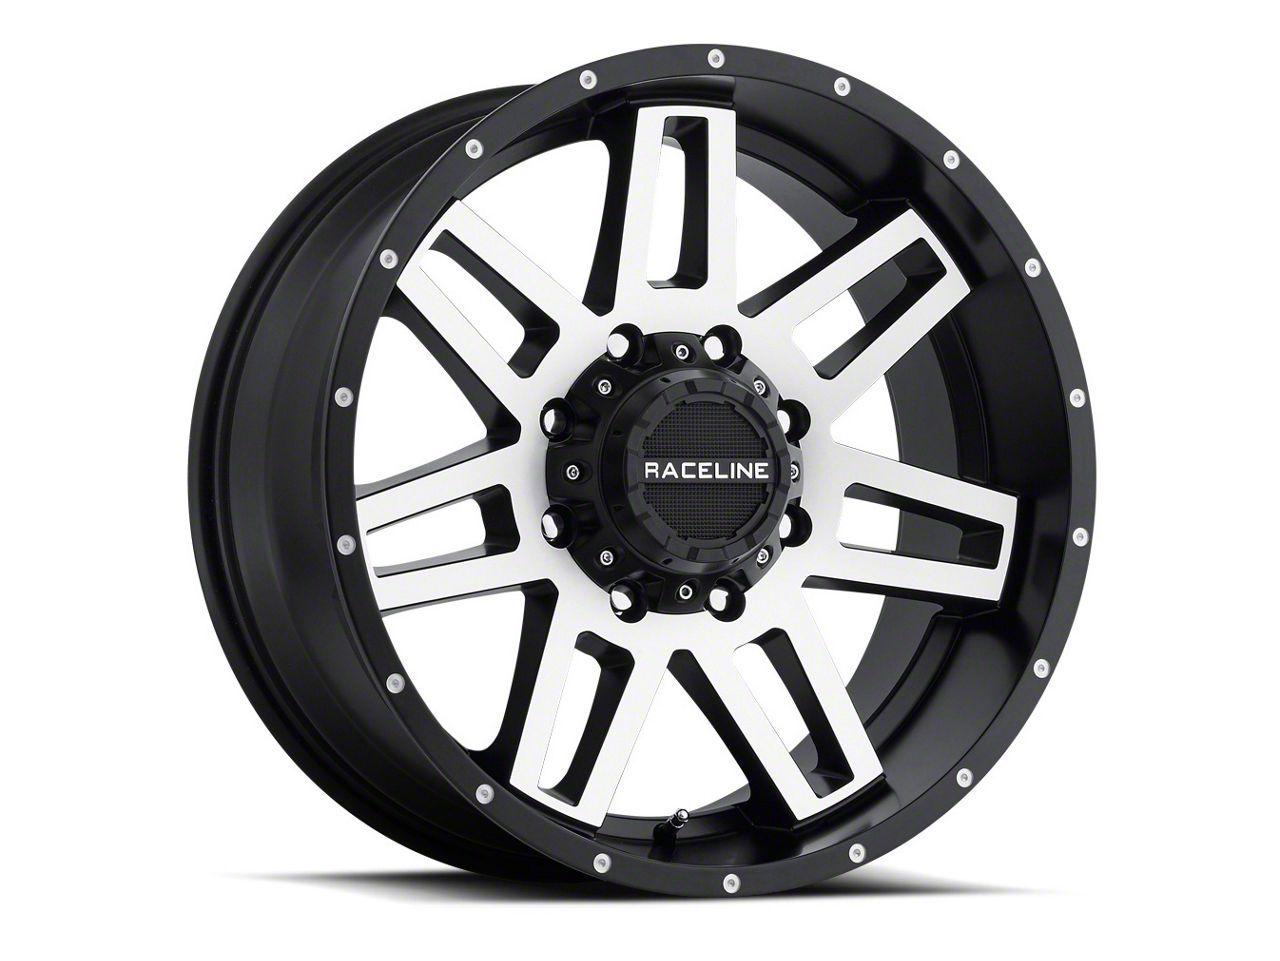 Raceline Injector Black Machined Wheel - 17x8.5 (18-19 Jeep Wrangler JL)